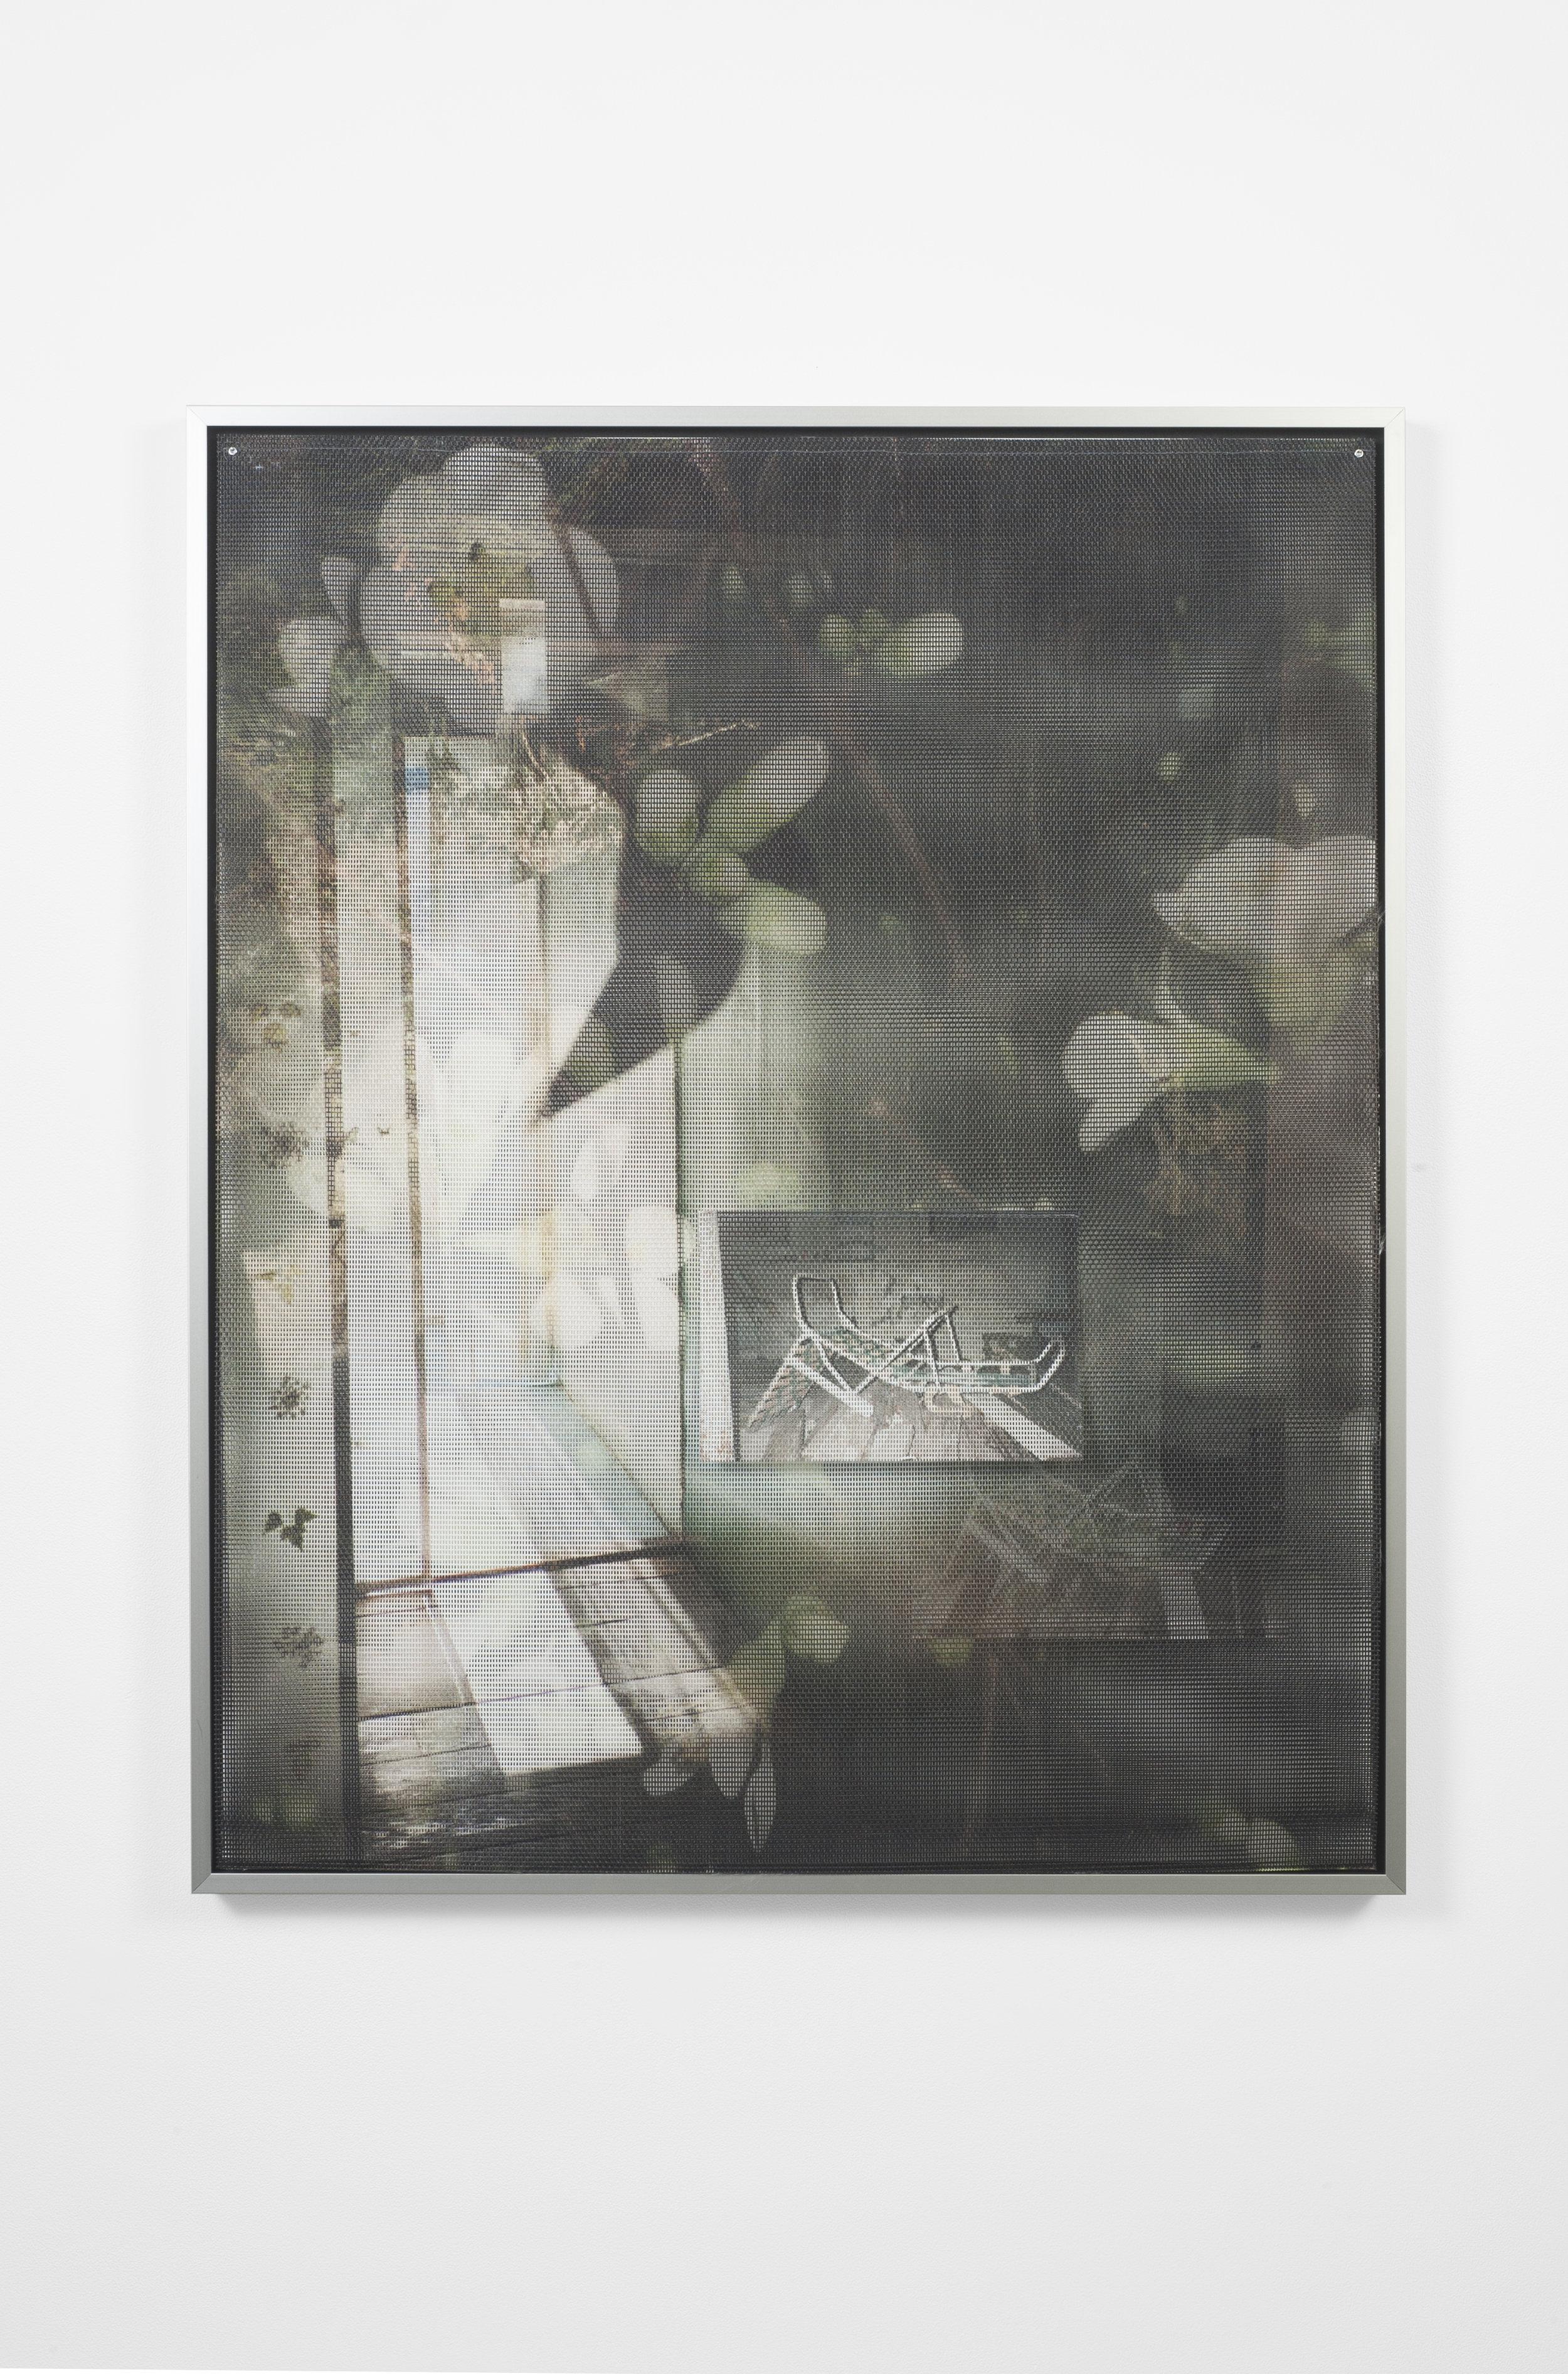 Ellie Hunter,  Untitled,  2019, UV inkjet print on vinyl mesh, 24.4 x 31.5 inches